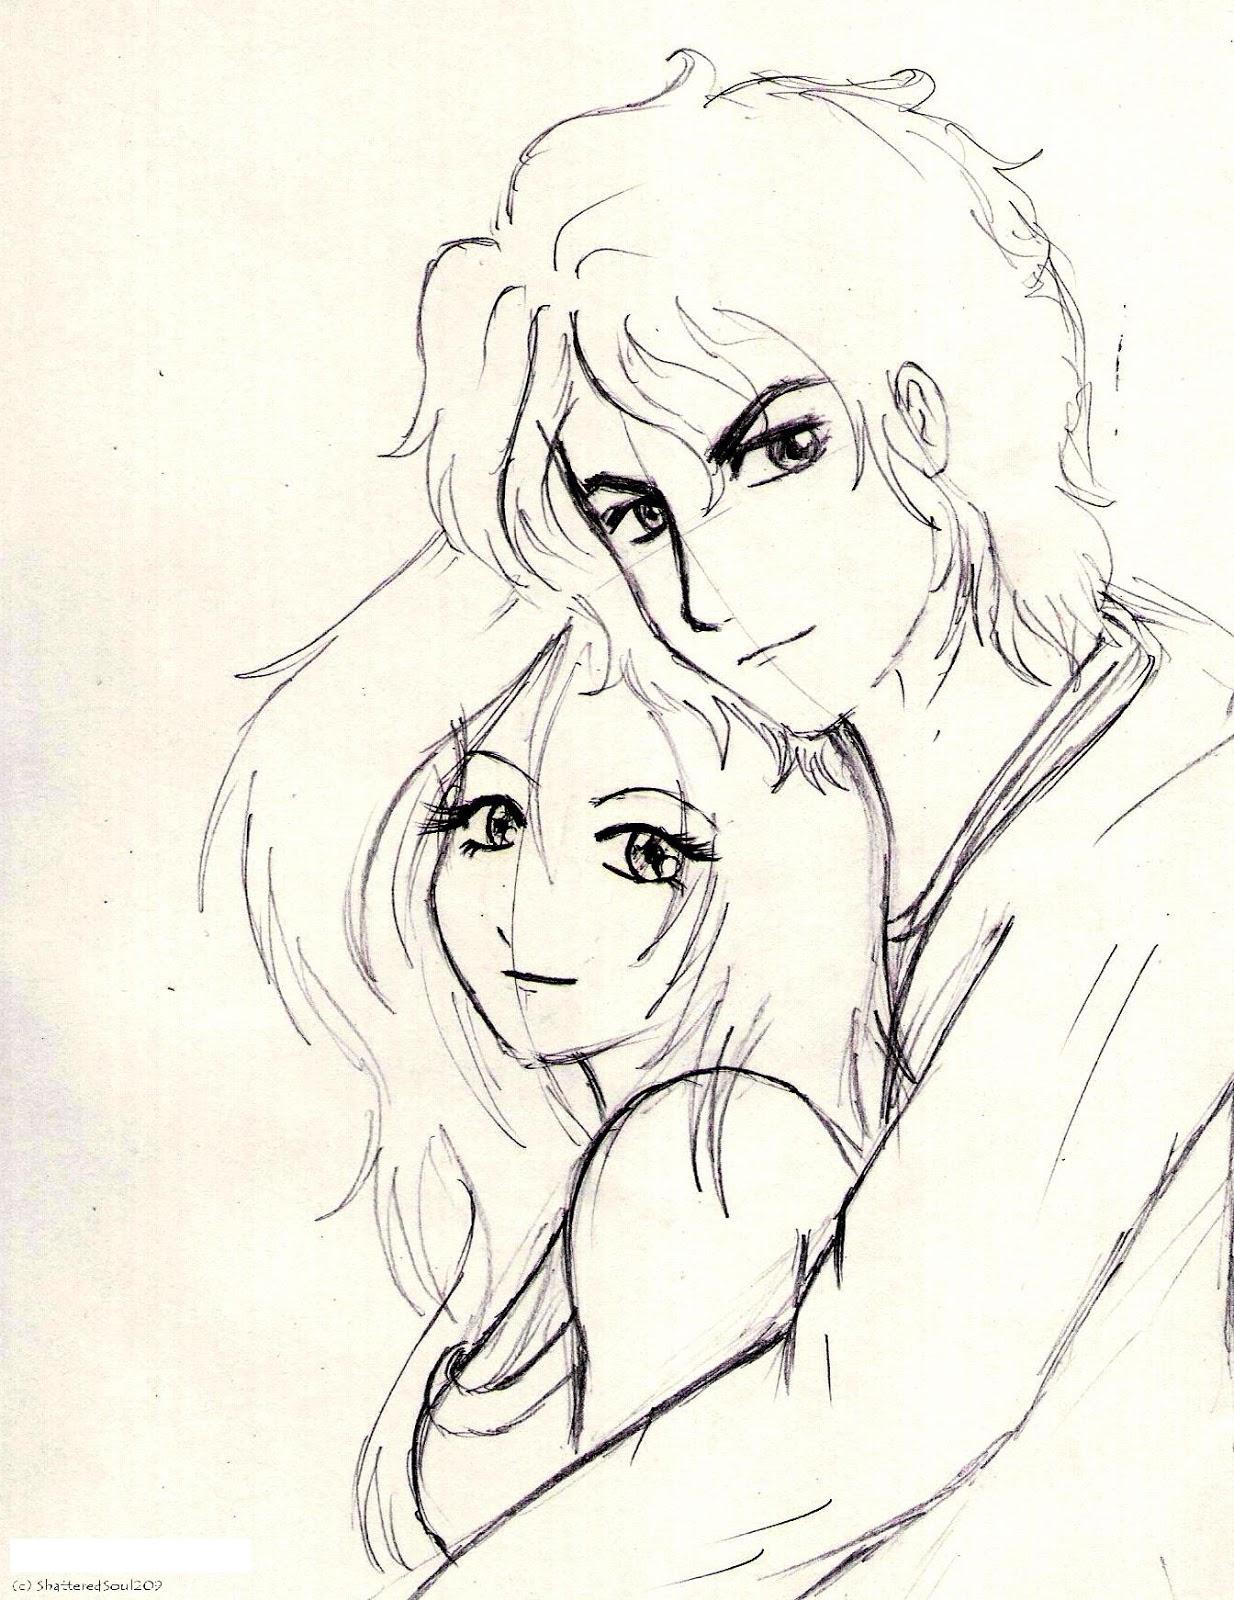 1234x1600 Sad Love Boy And Girl Drawing Boy Sad Love Drawing Love Sad Image